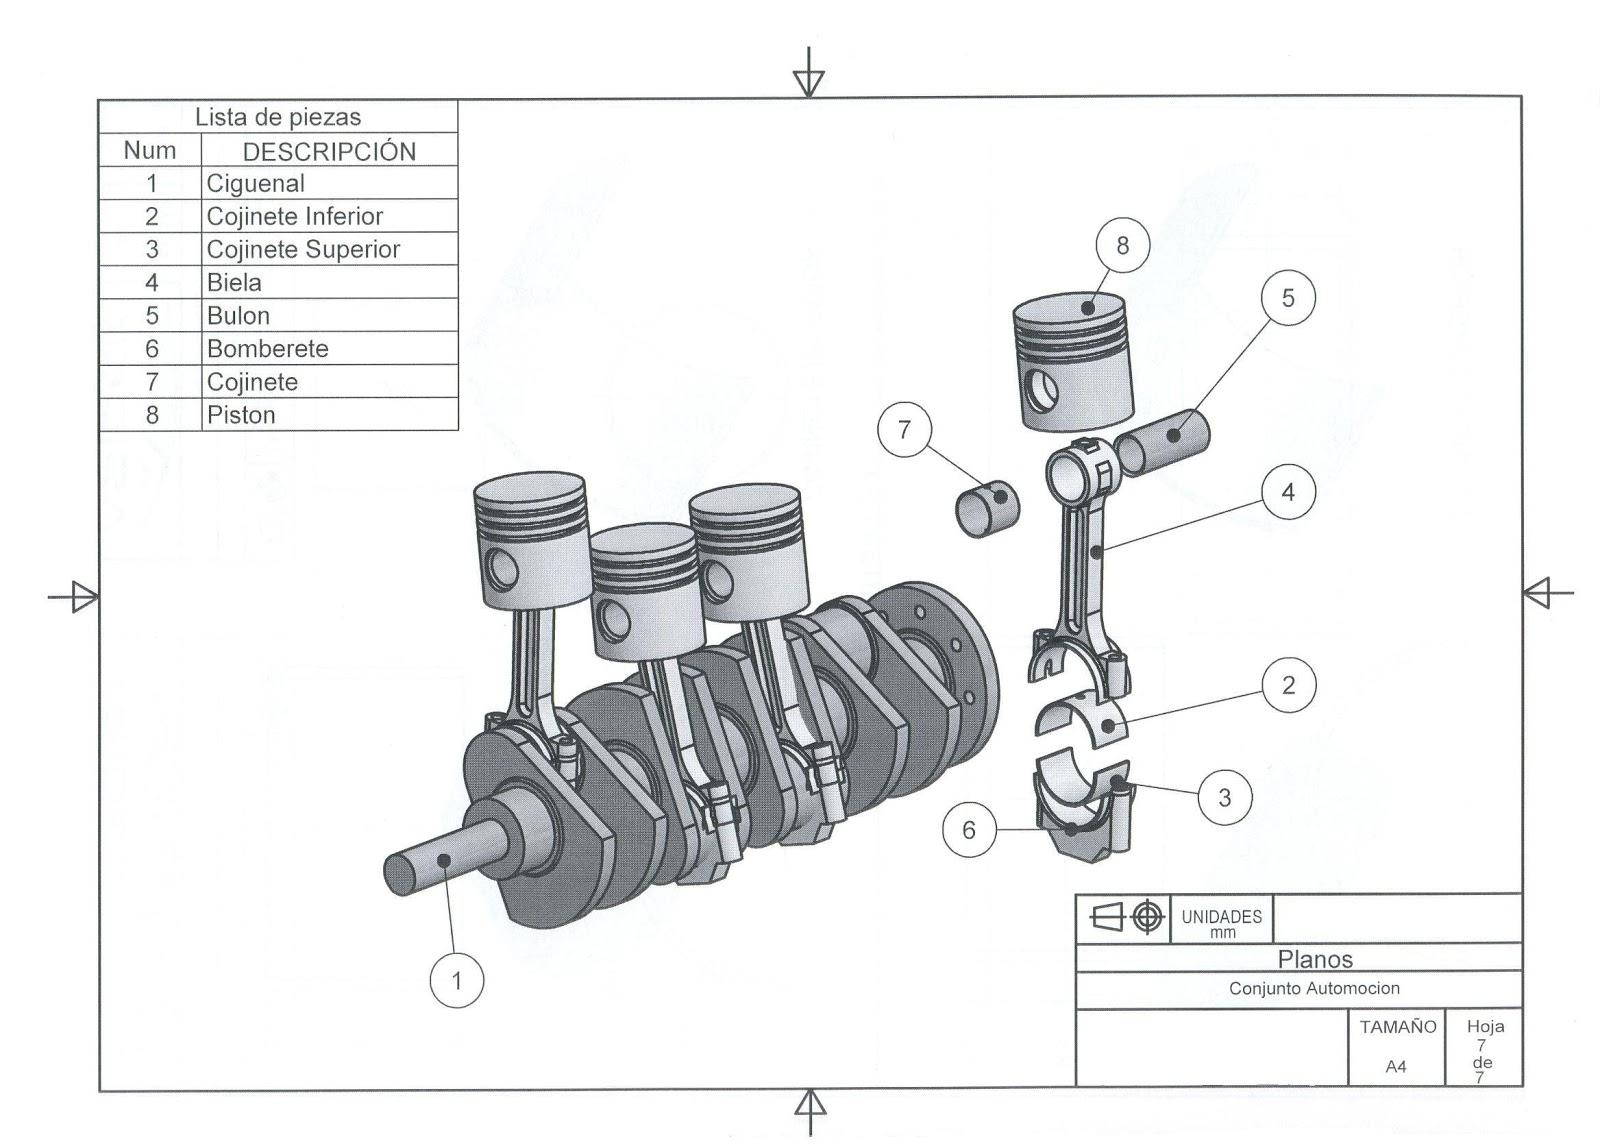 Catia E Inventor Con Ciri Motor 4 Pistones Y Ciguenal